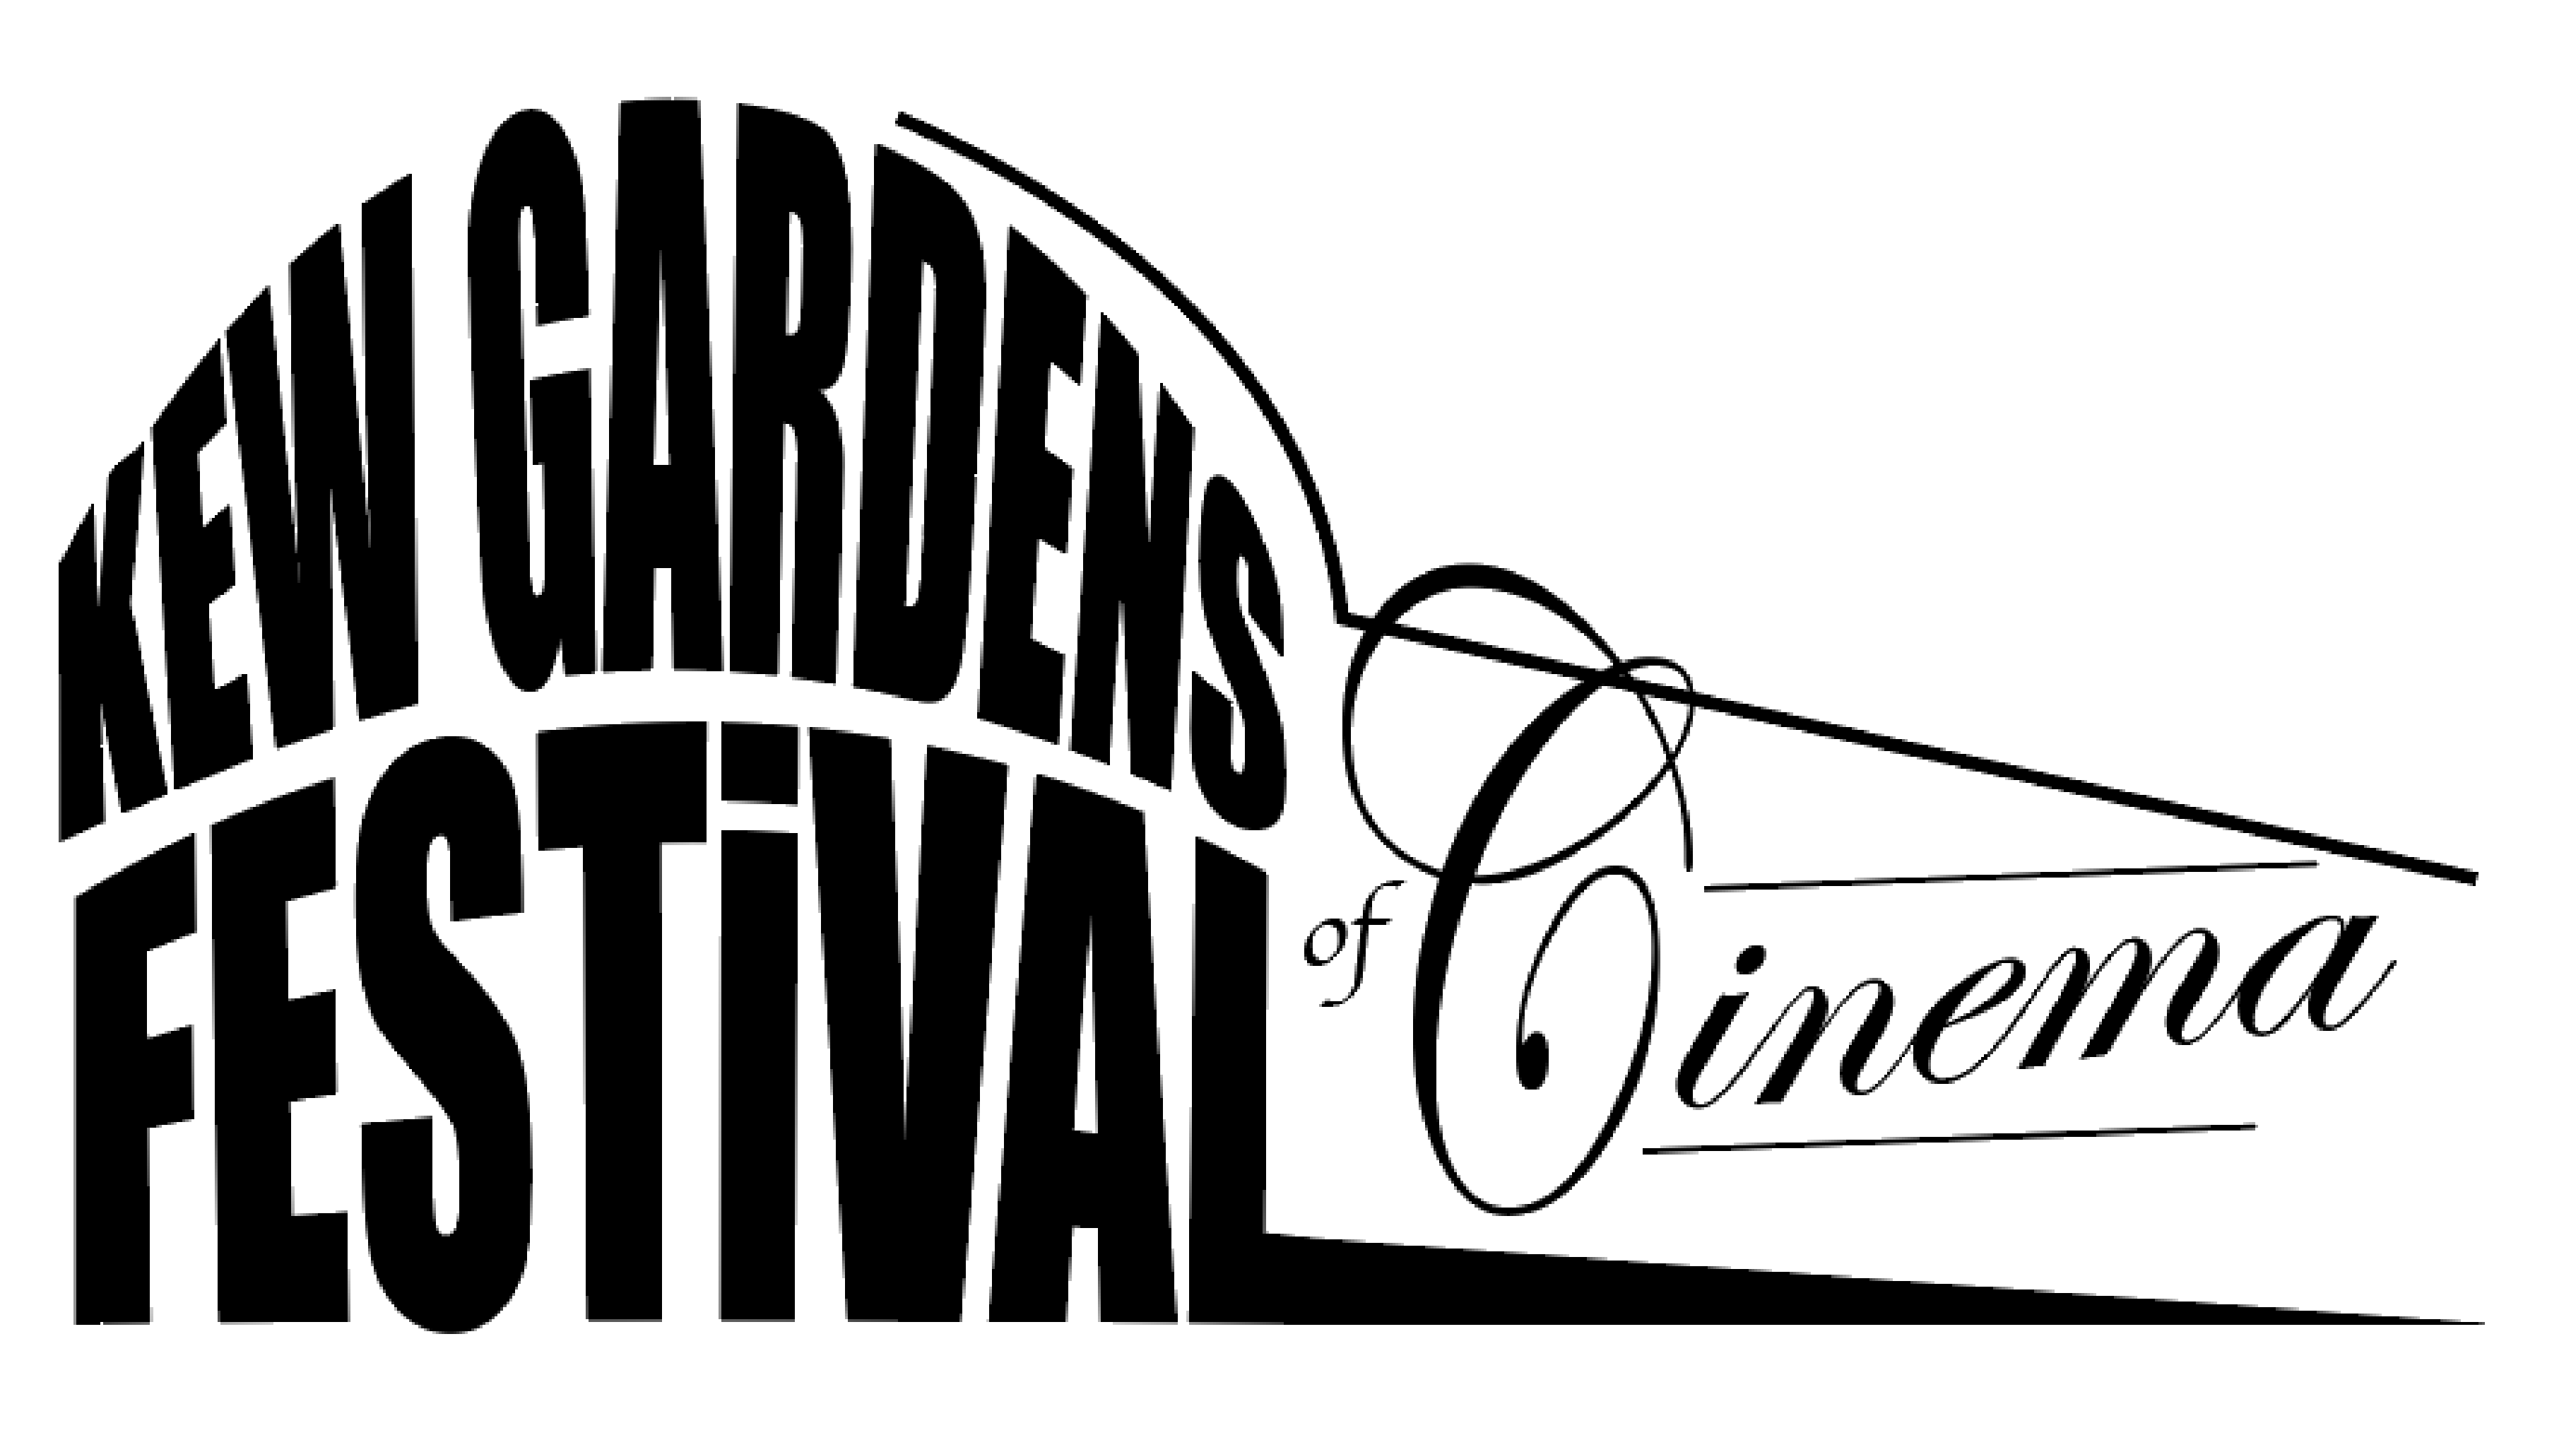 Kew Gardens Festival Of Cinema WANTS YOUR FILMS